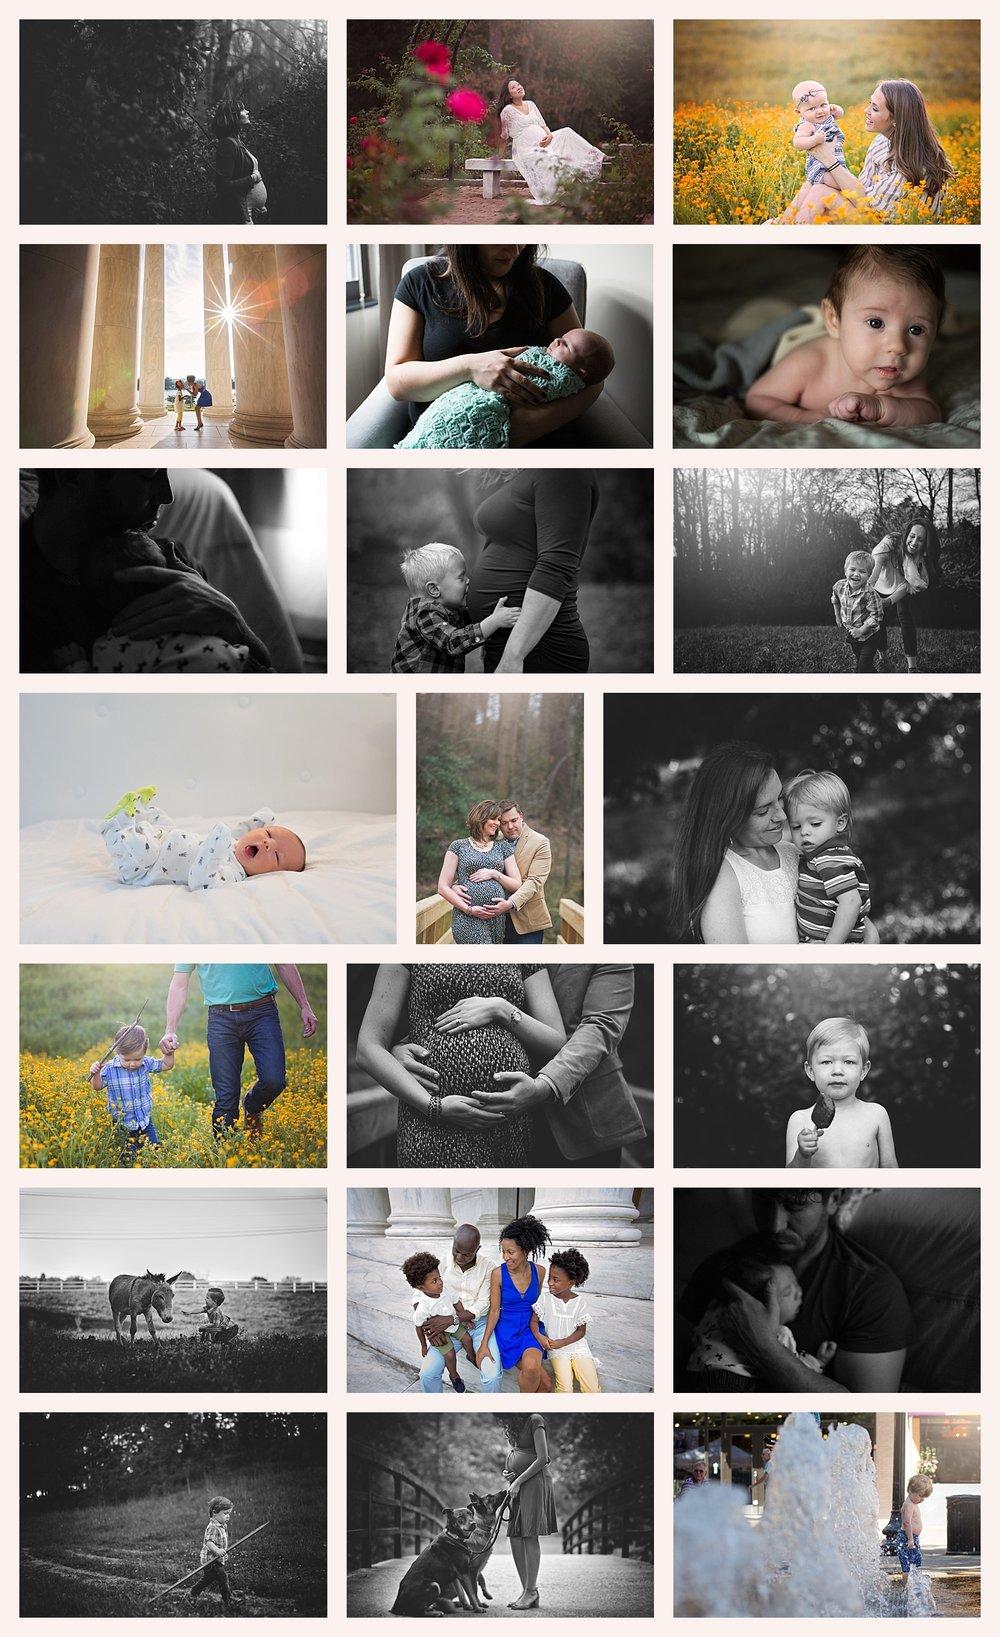 Rachel K Photo 2016 favorites